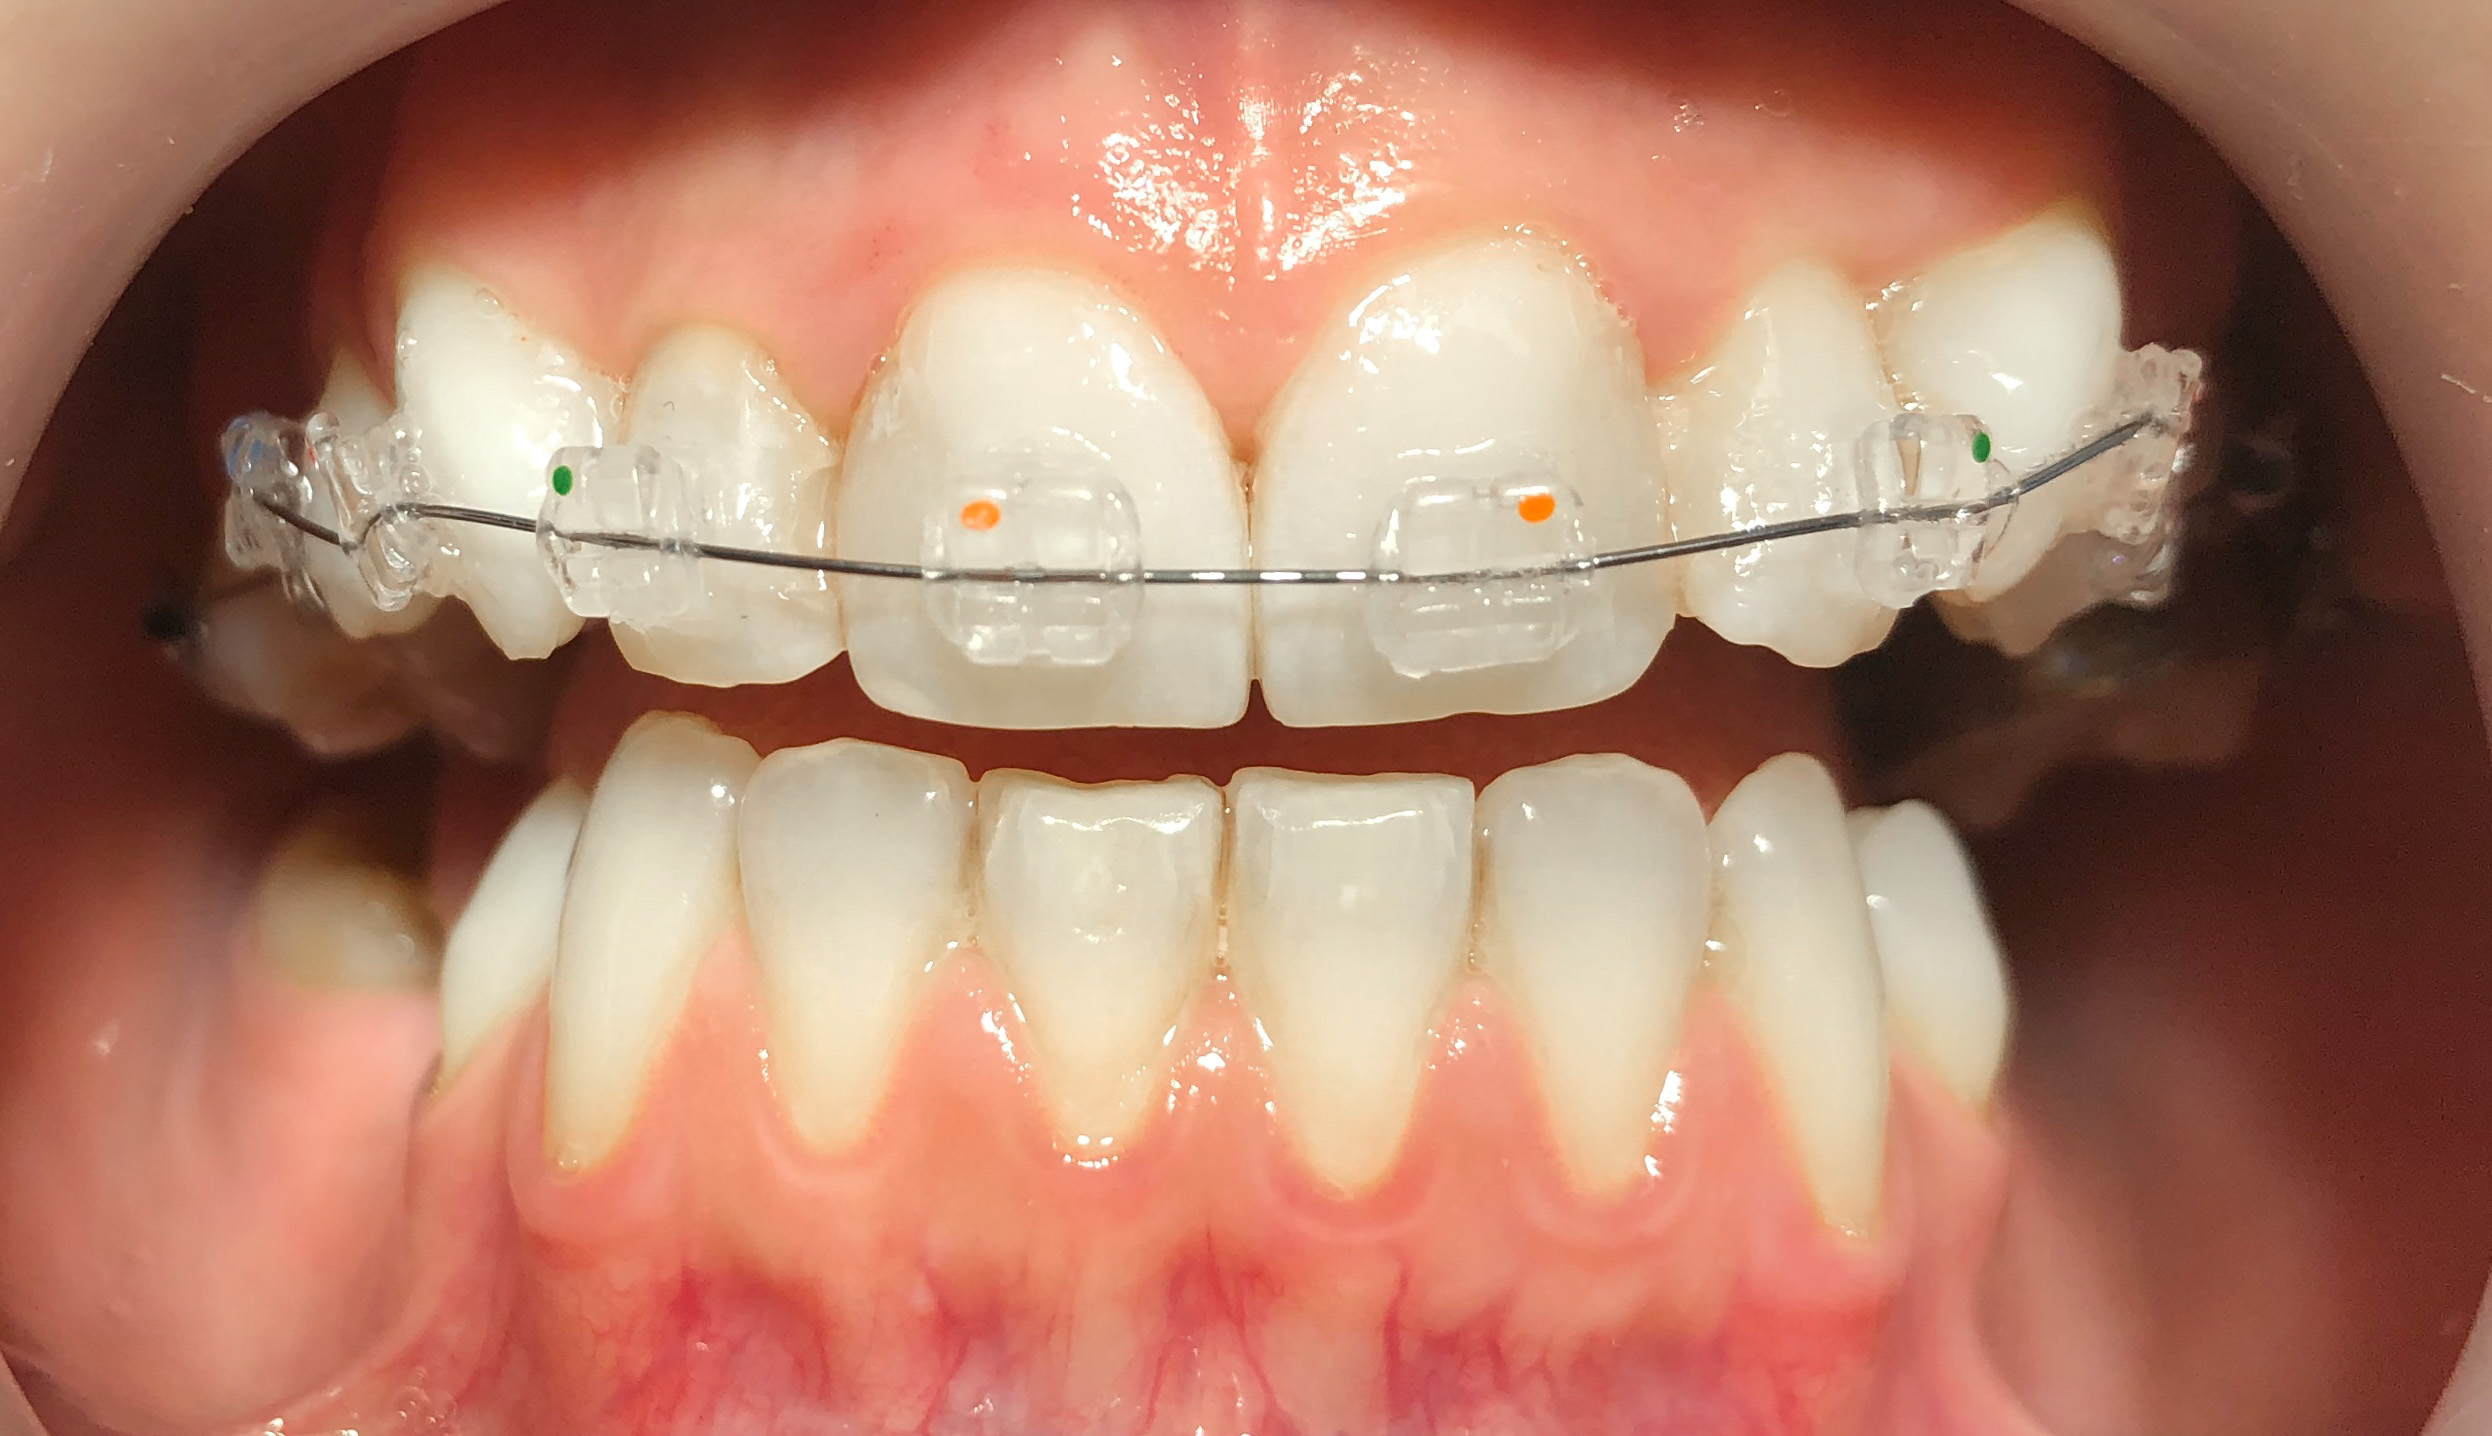 Foto: 'Dental Aesthetics' Kiseljak